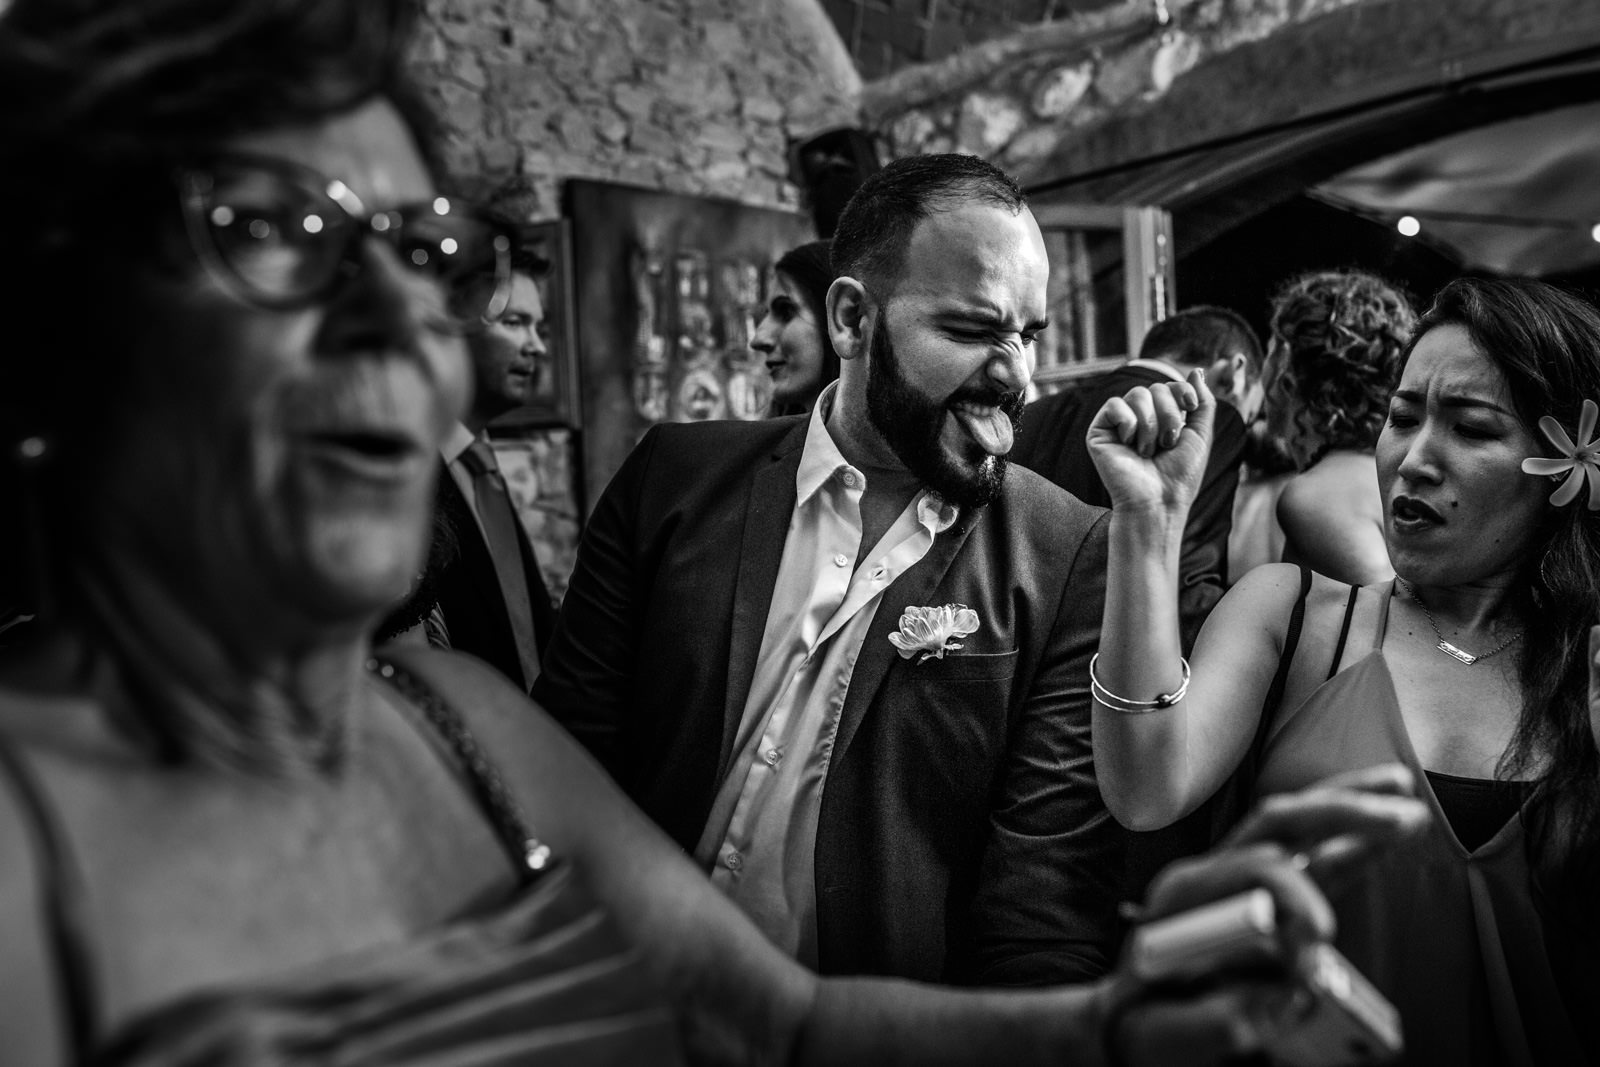 Almirall-Font-sitges-marbella-engagement-Rafael-Torres-fotografo-bodas-sevilla-madrid-barcelona-wedding-photographer--82.jpg